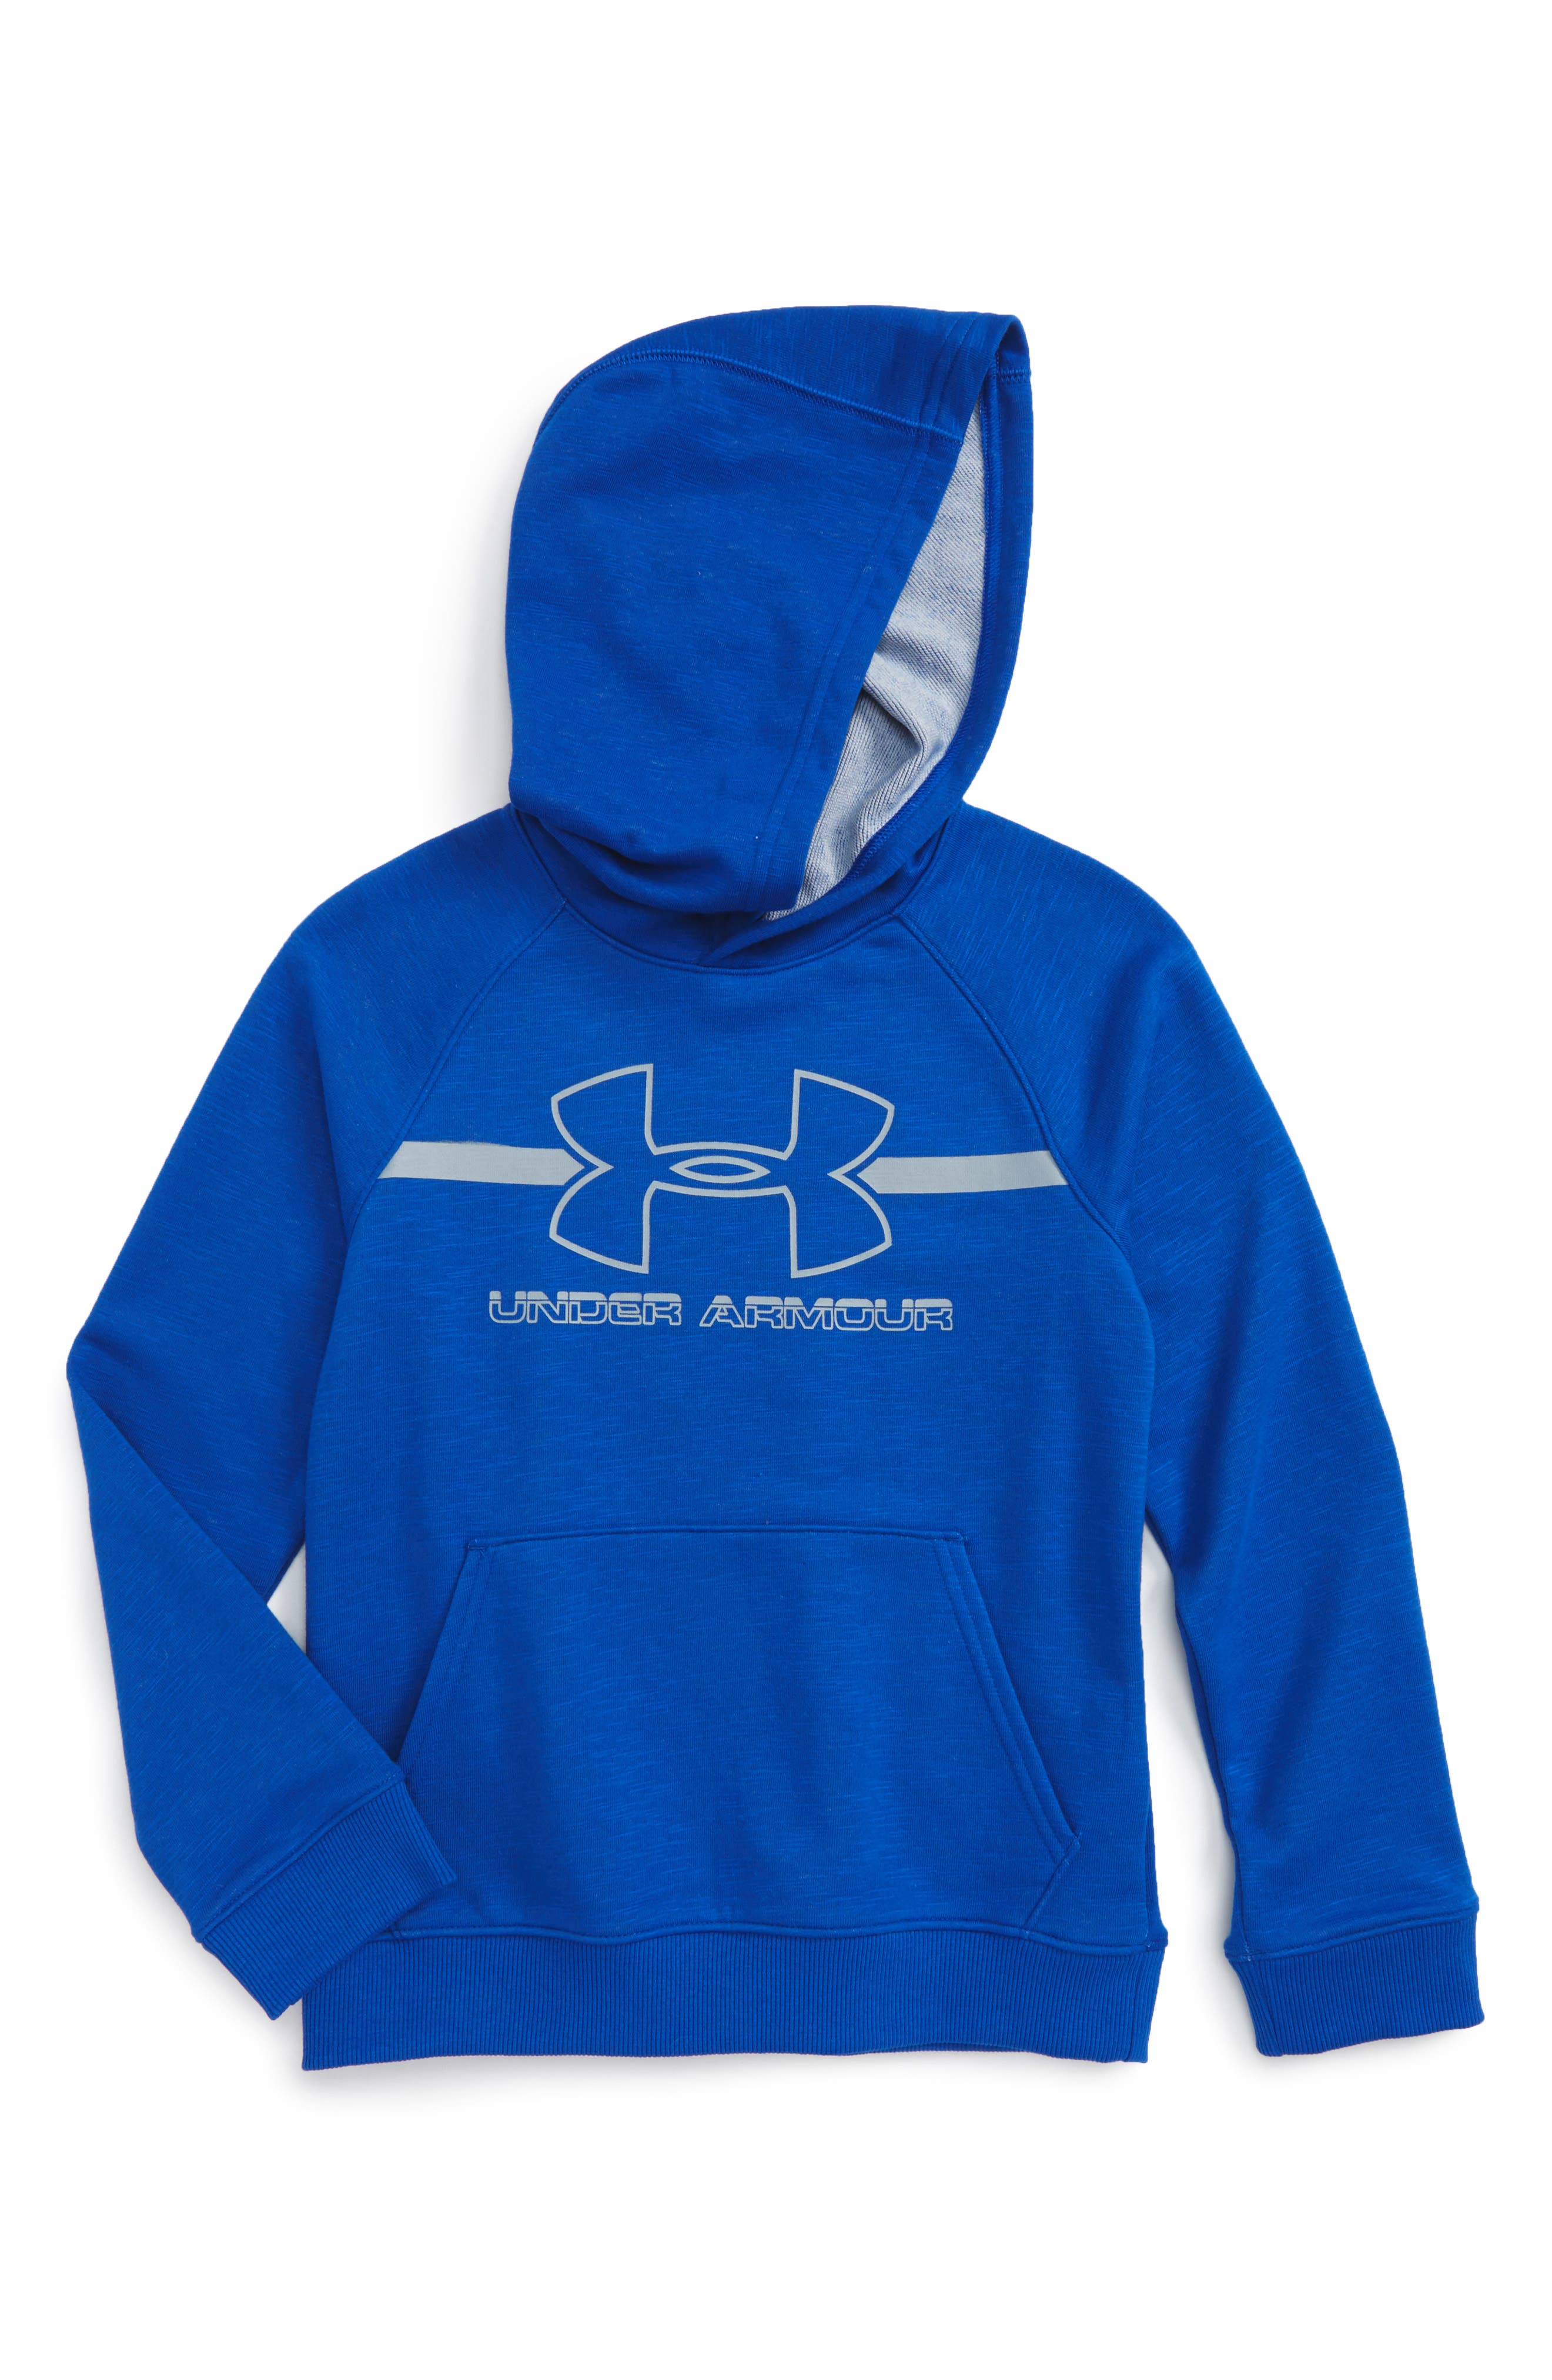 Alternate Image 1 Selected - Under Armour Logo Hooded Sweatshirt (Little Boys & Big Boys)